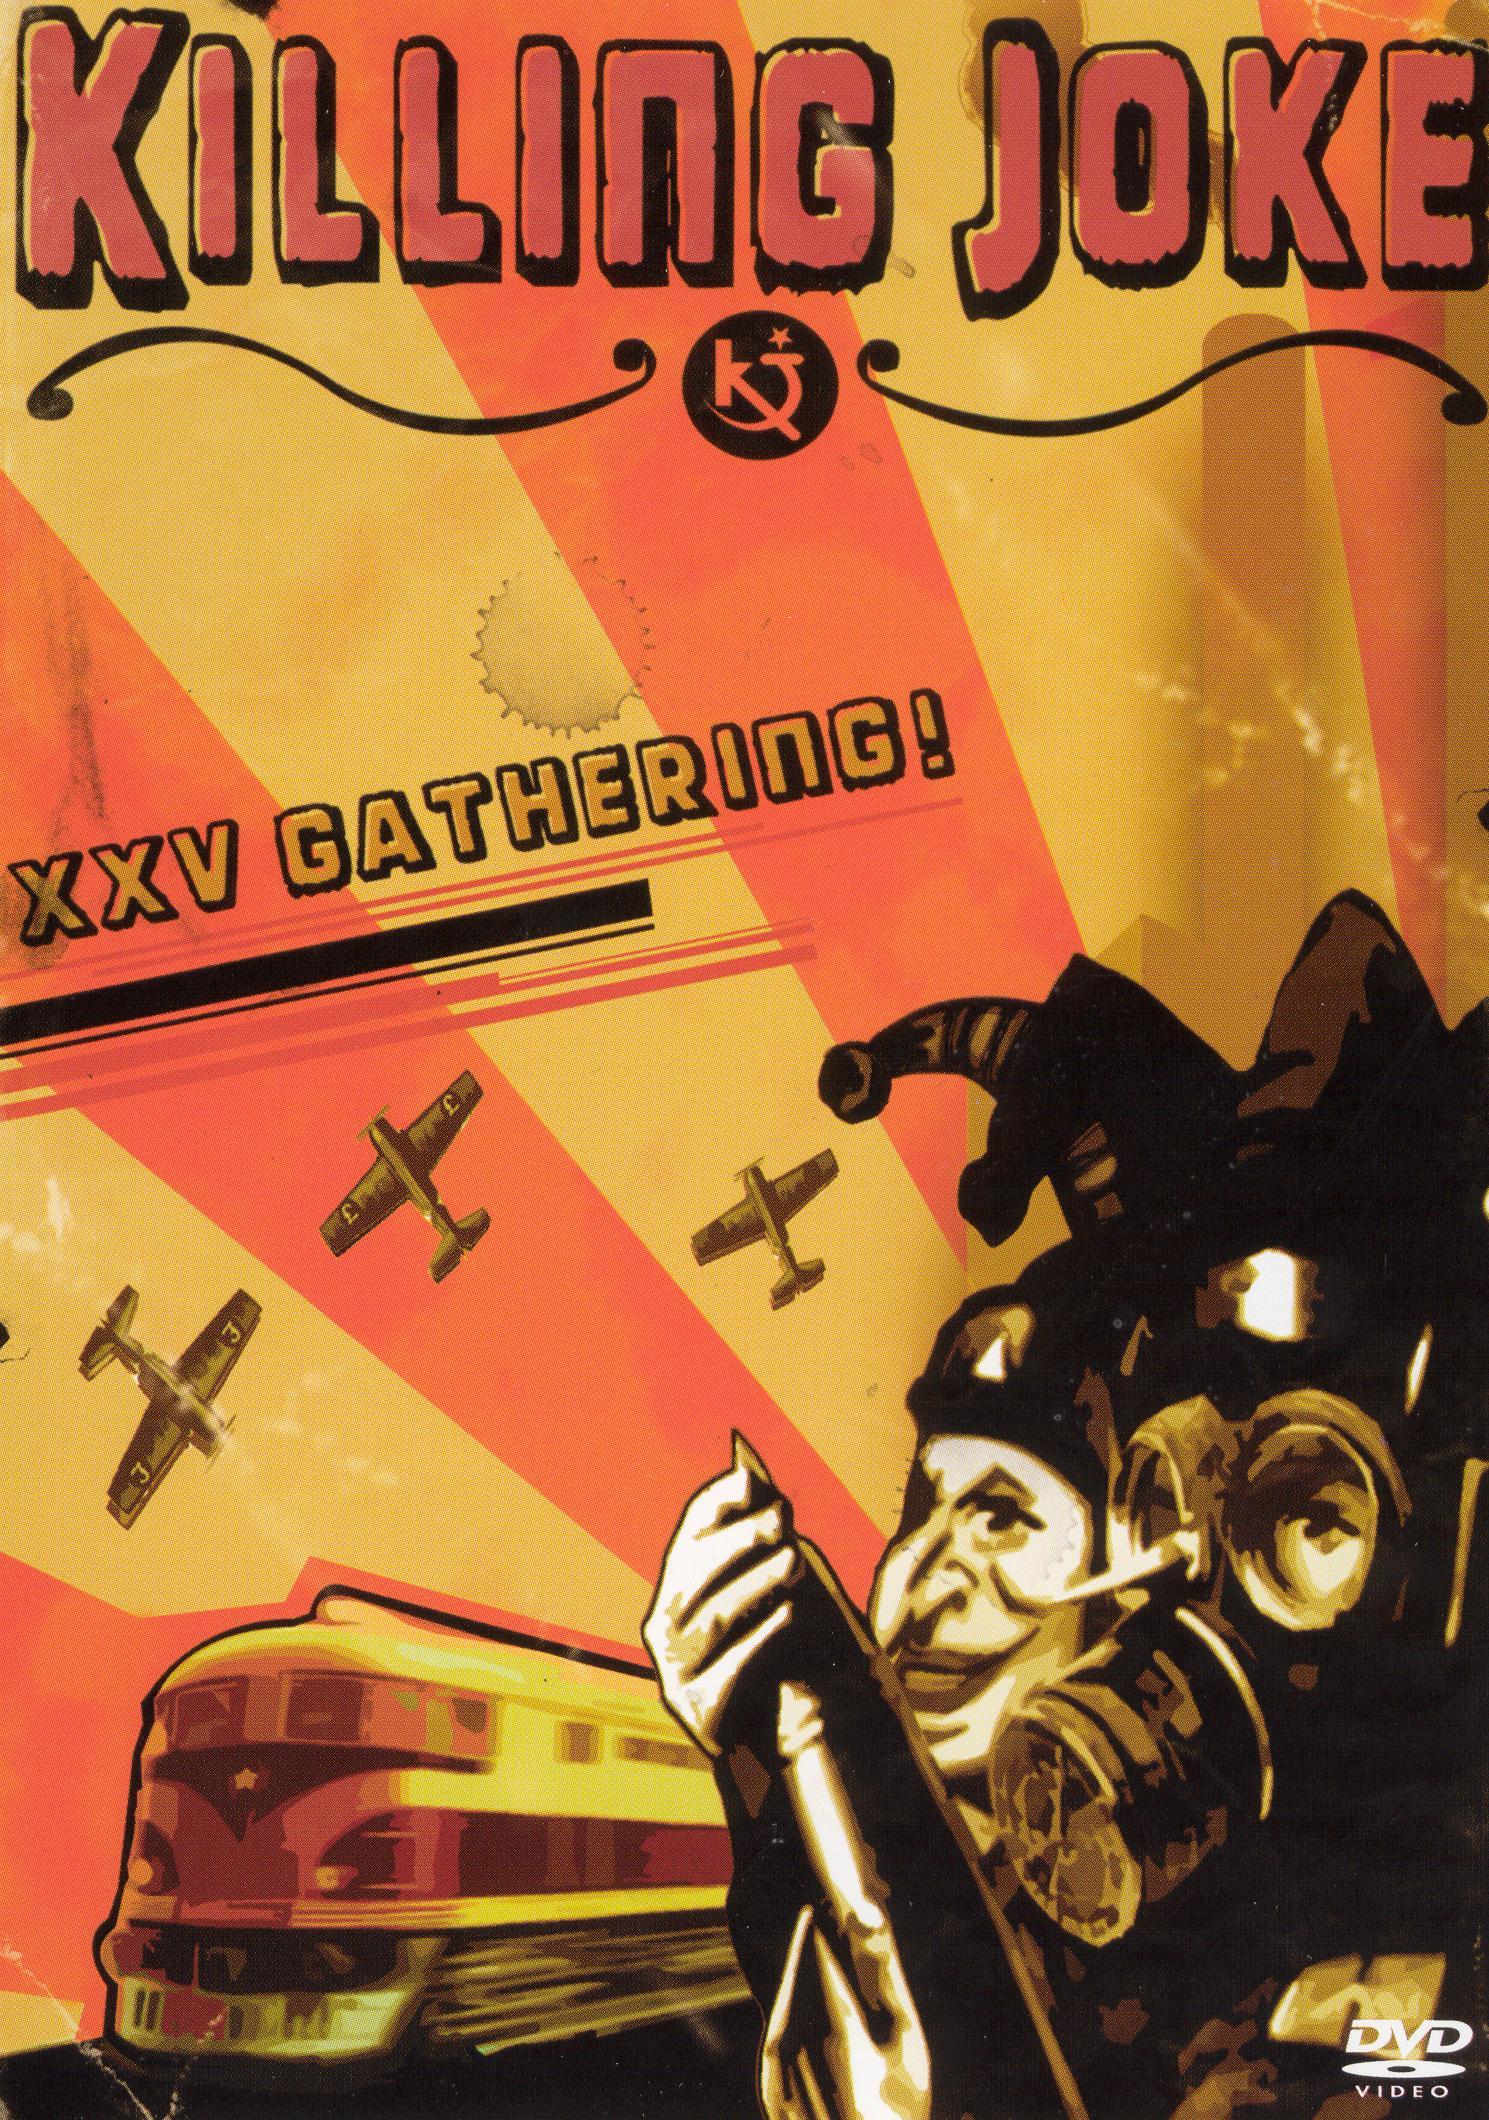 Killing Joke: XXV Gathering